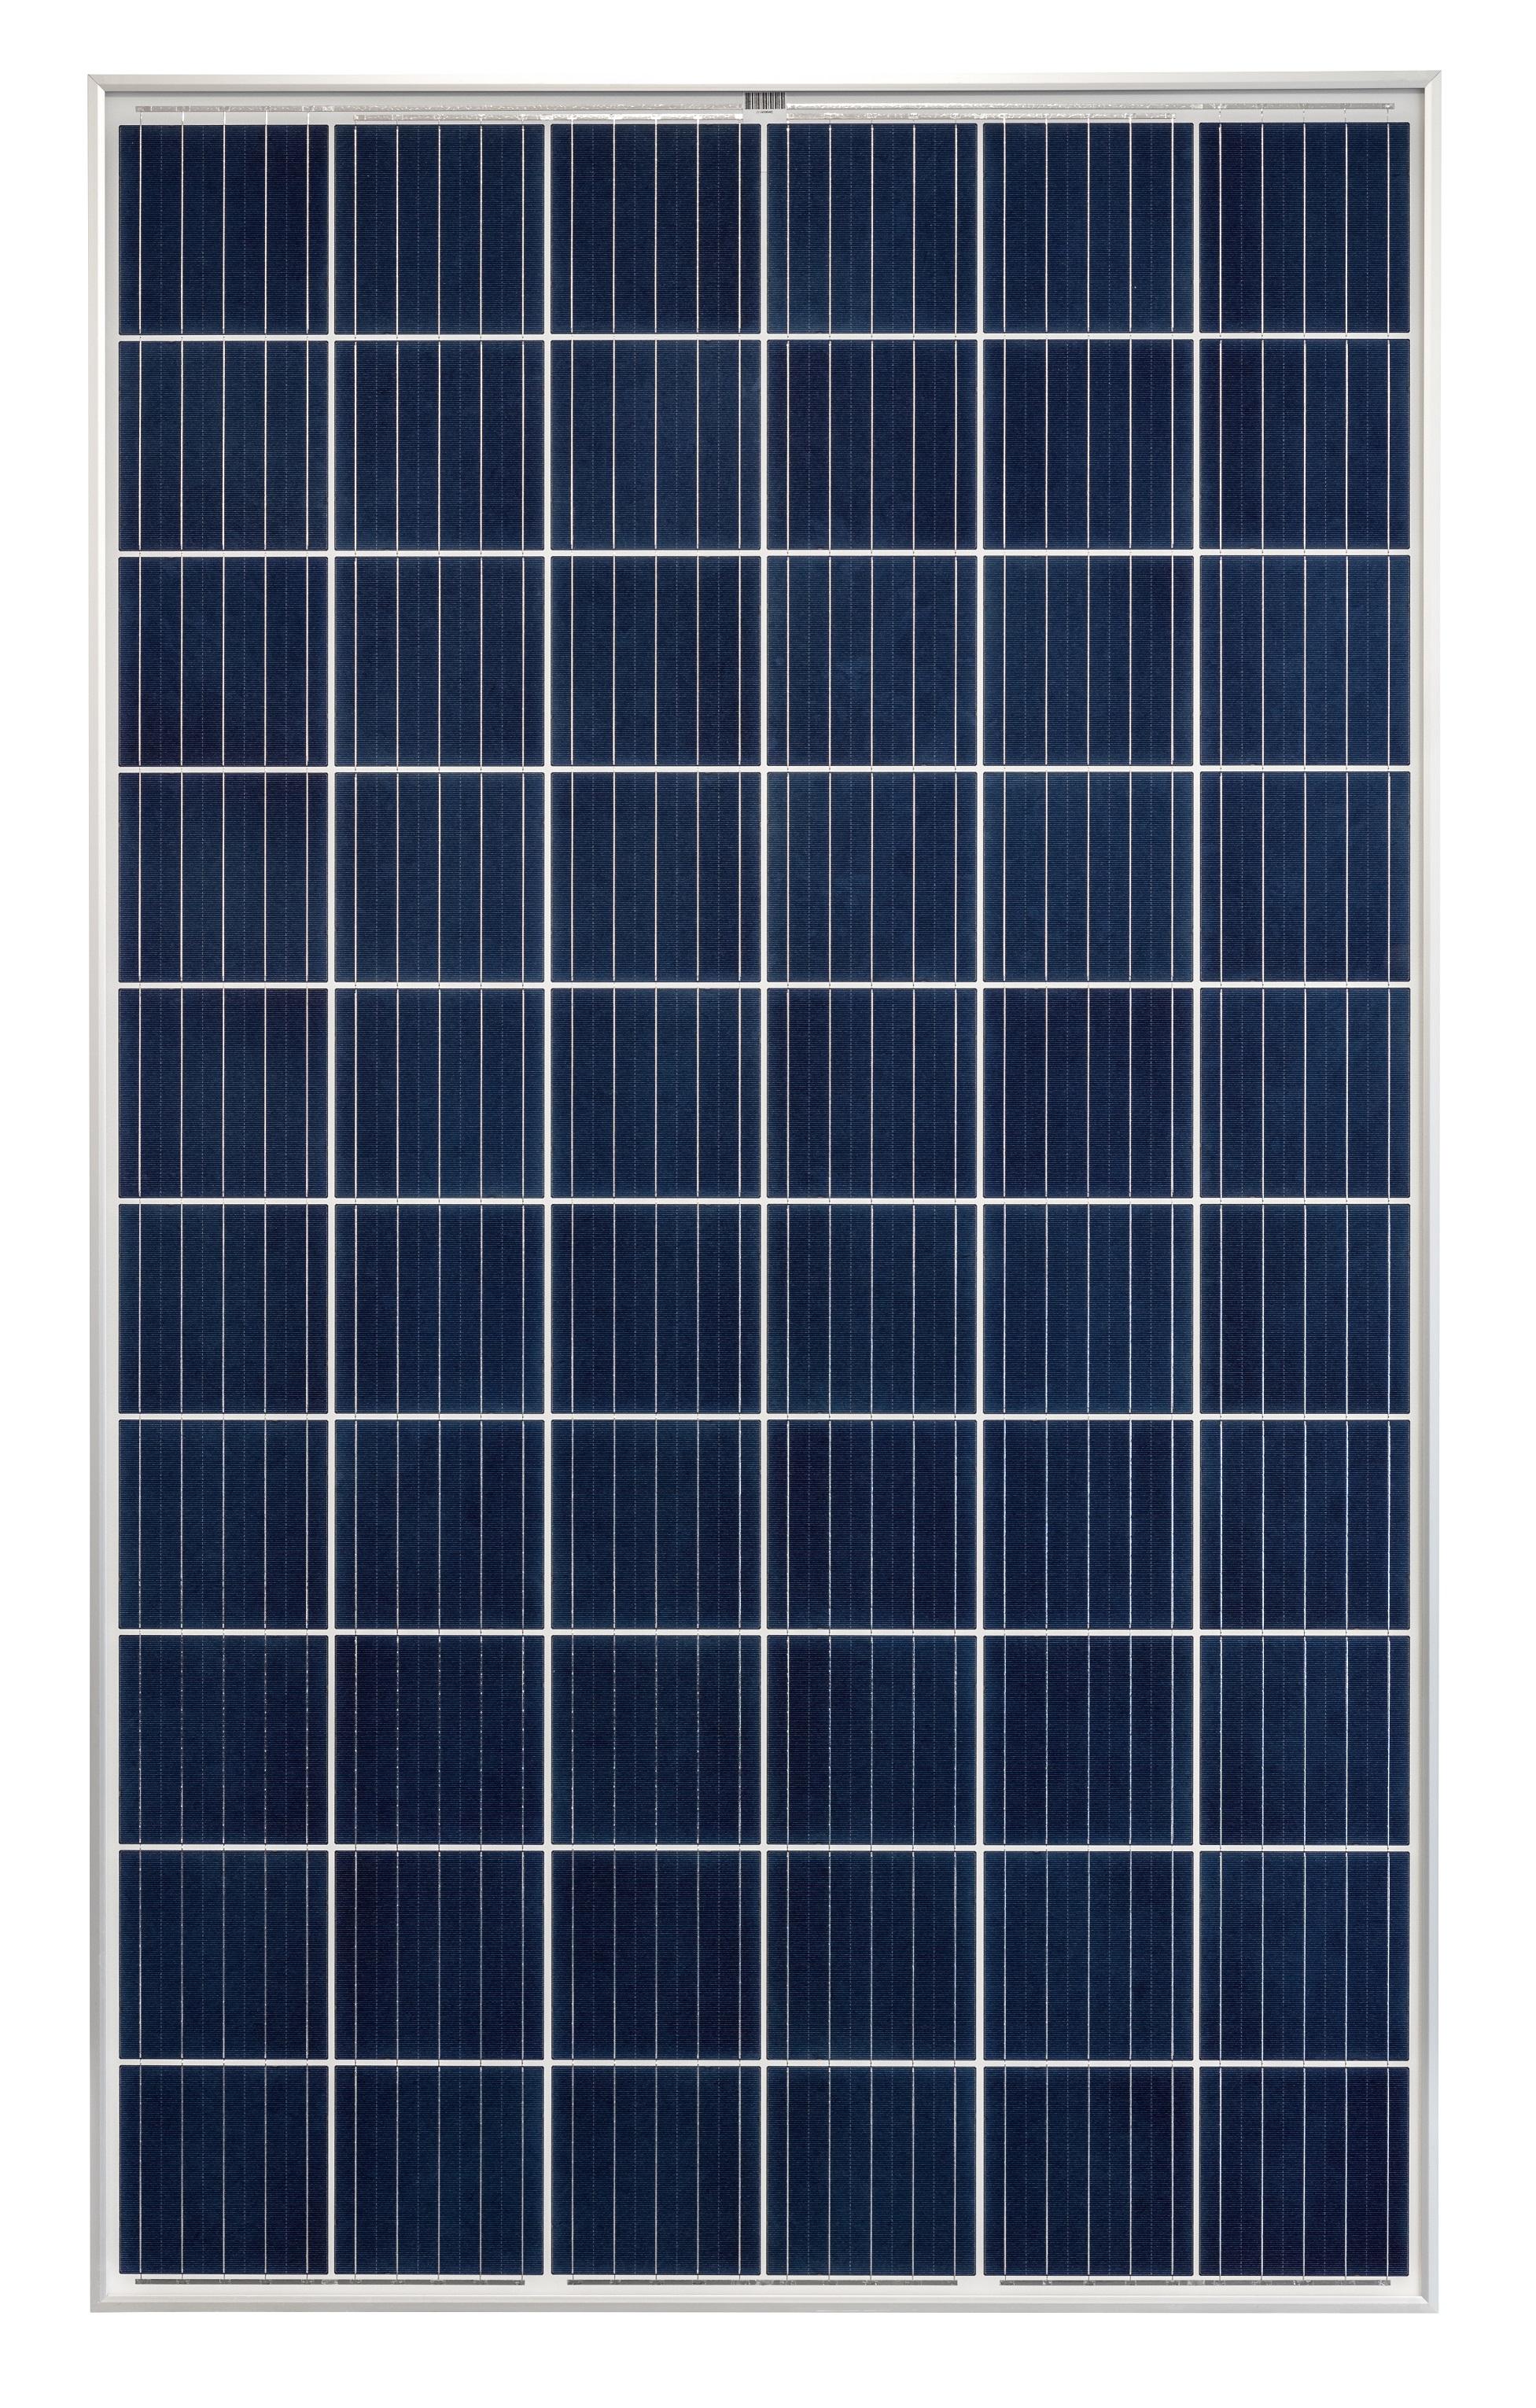 Polykristallines Solarmodul